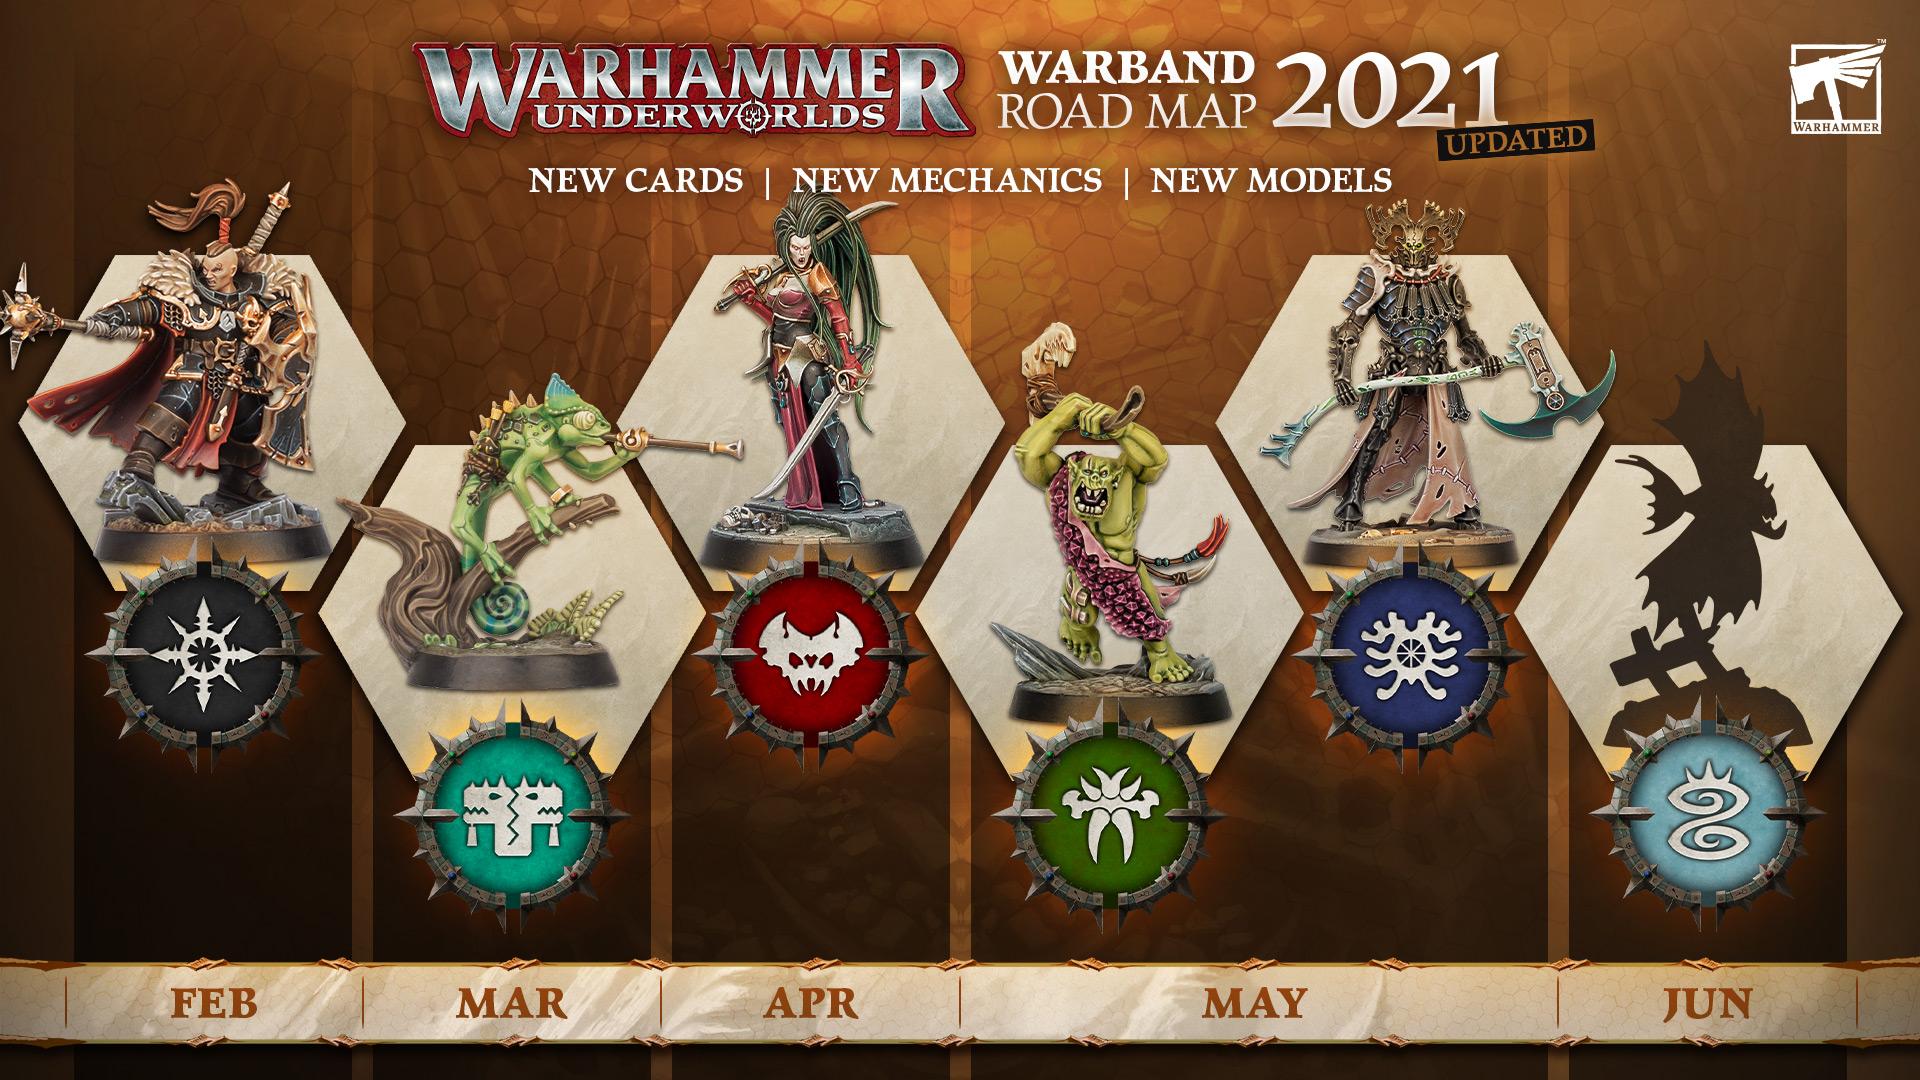 WHUW Roadmap2021 v4 Mar16 Final